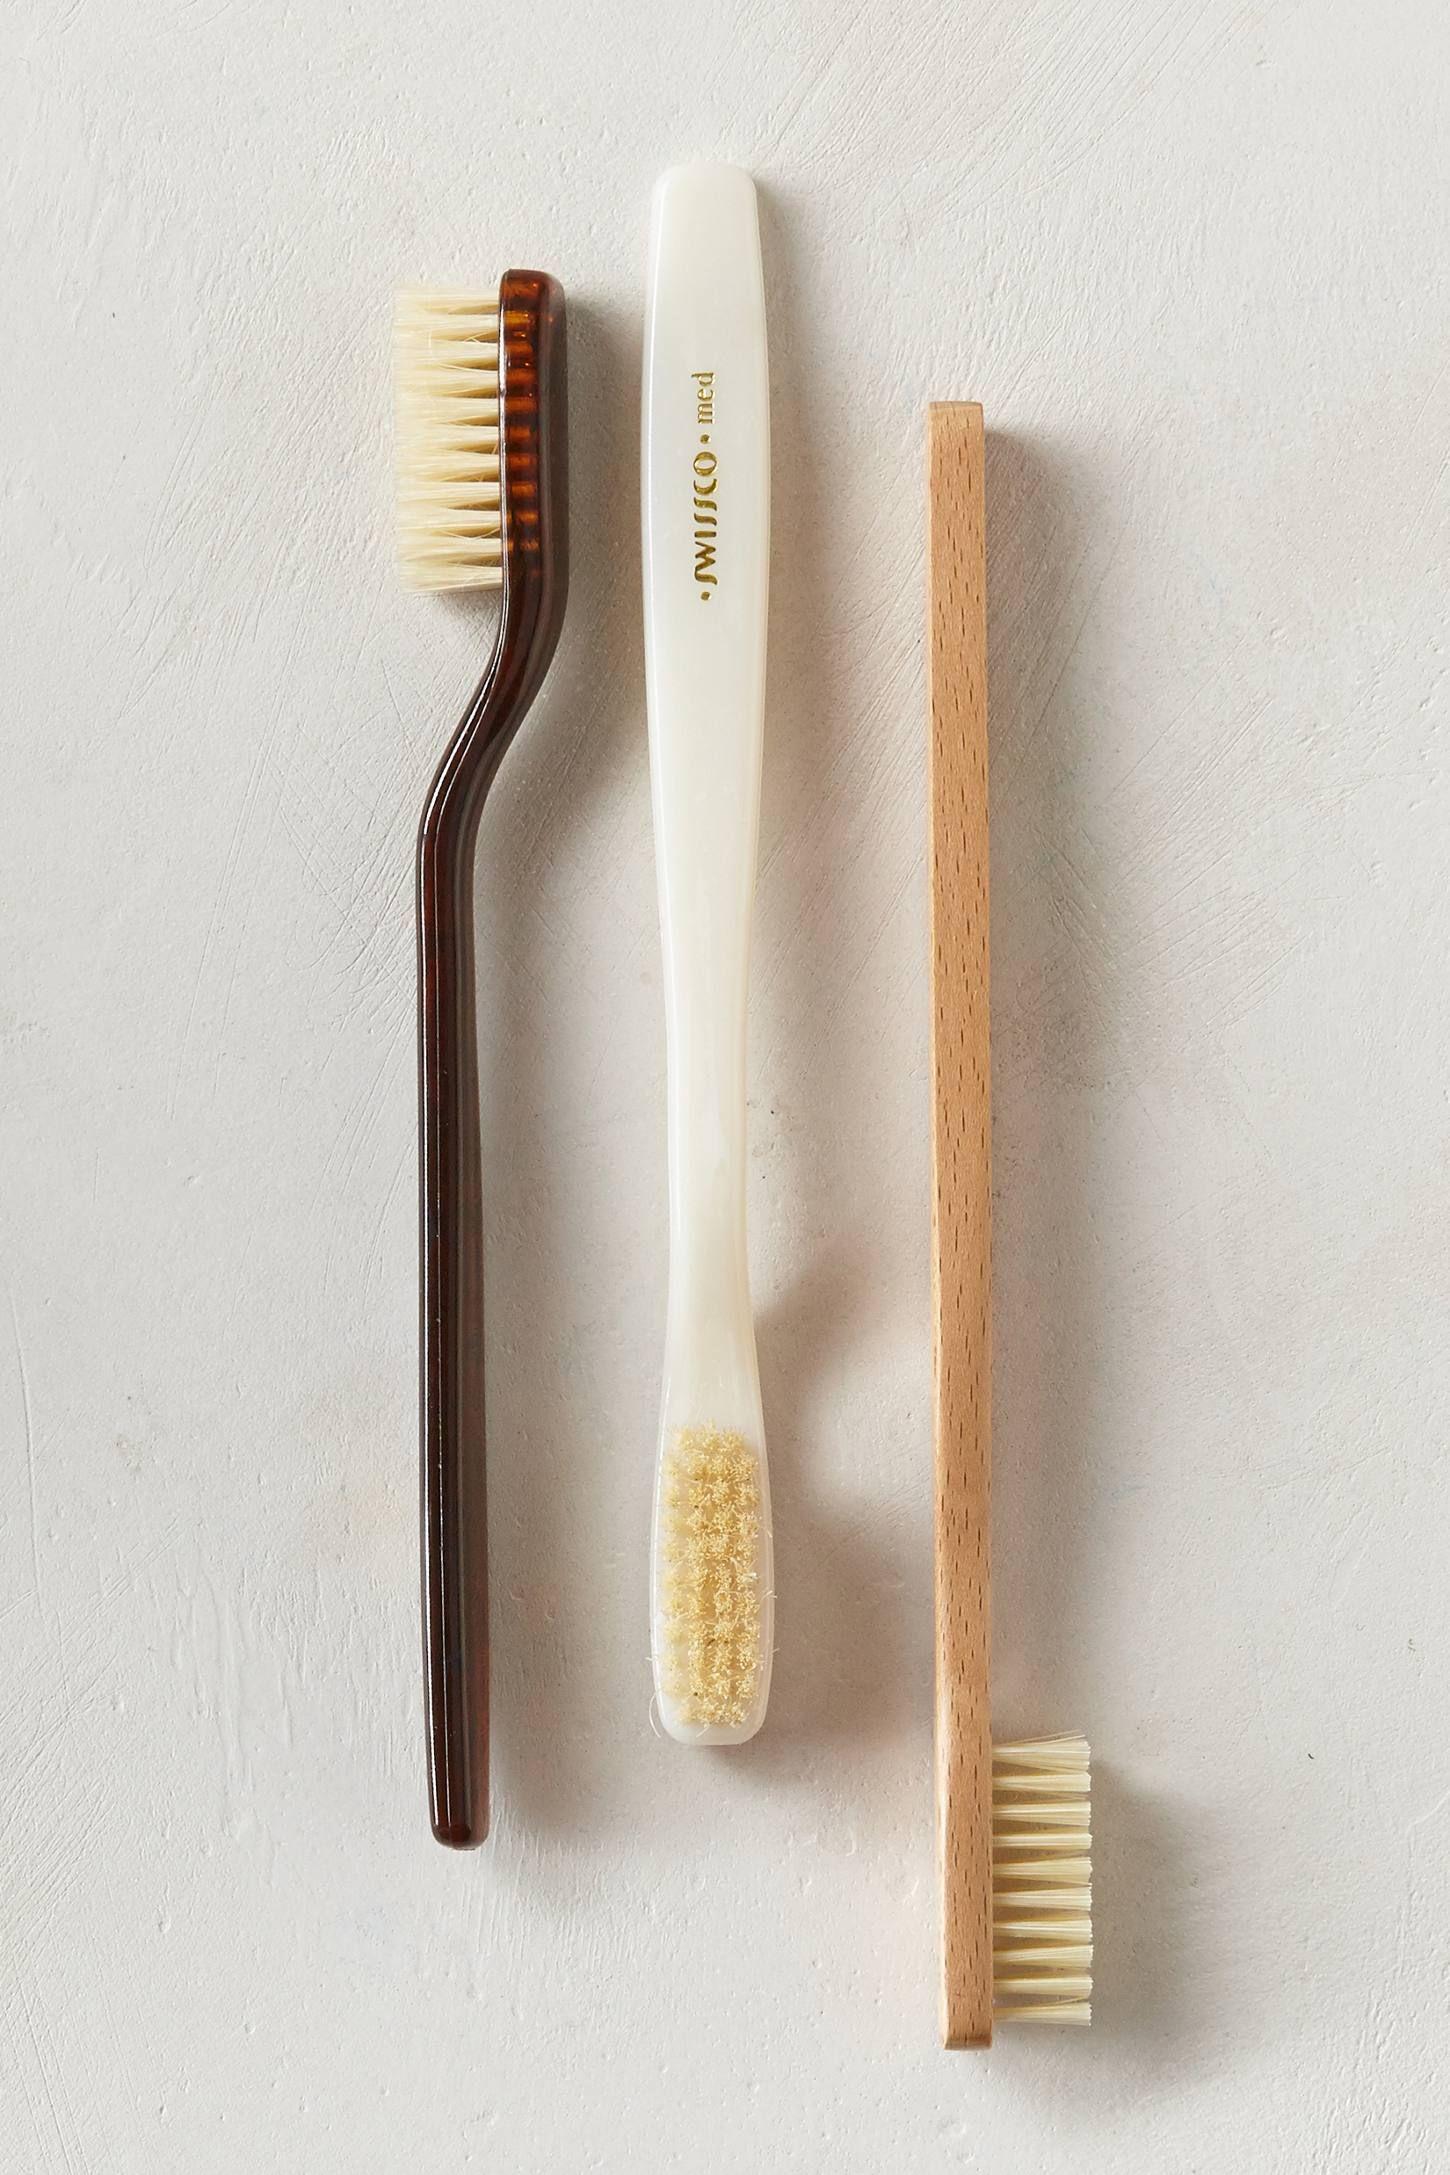 Swissco Toothbrush - anthropologie.com | Beauty | Pinterest ...